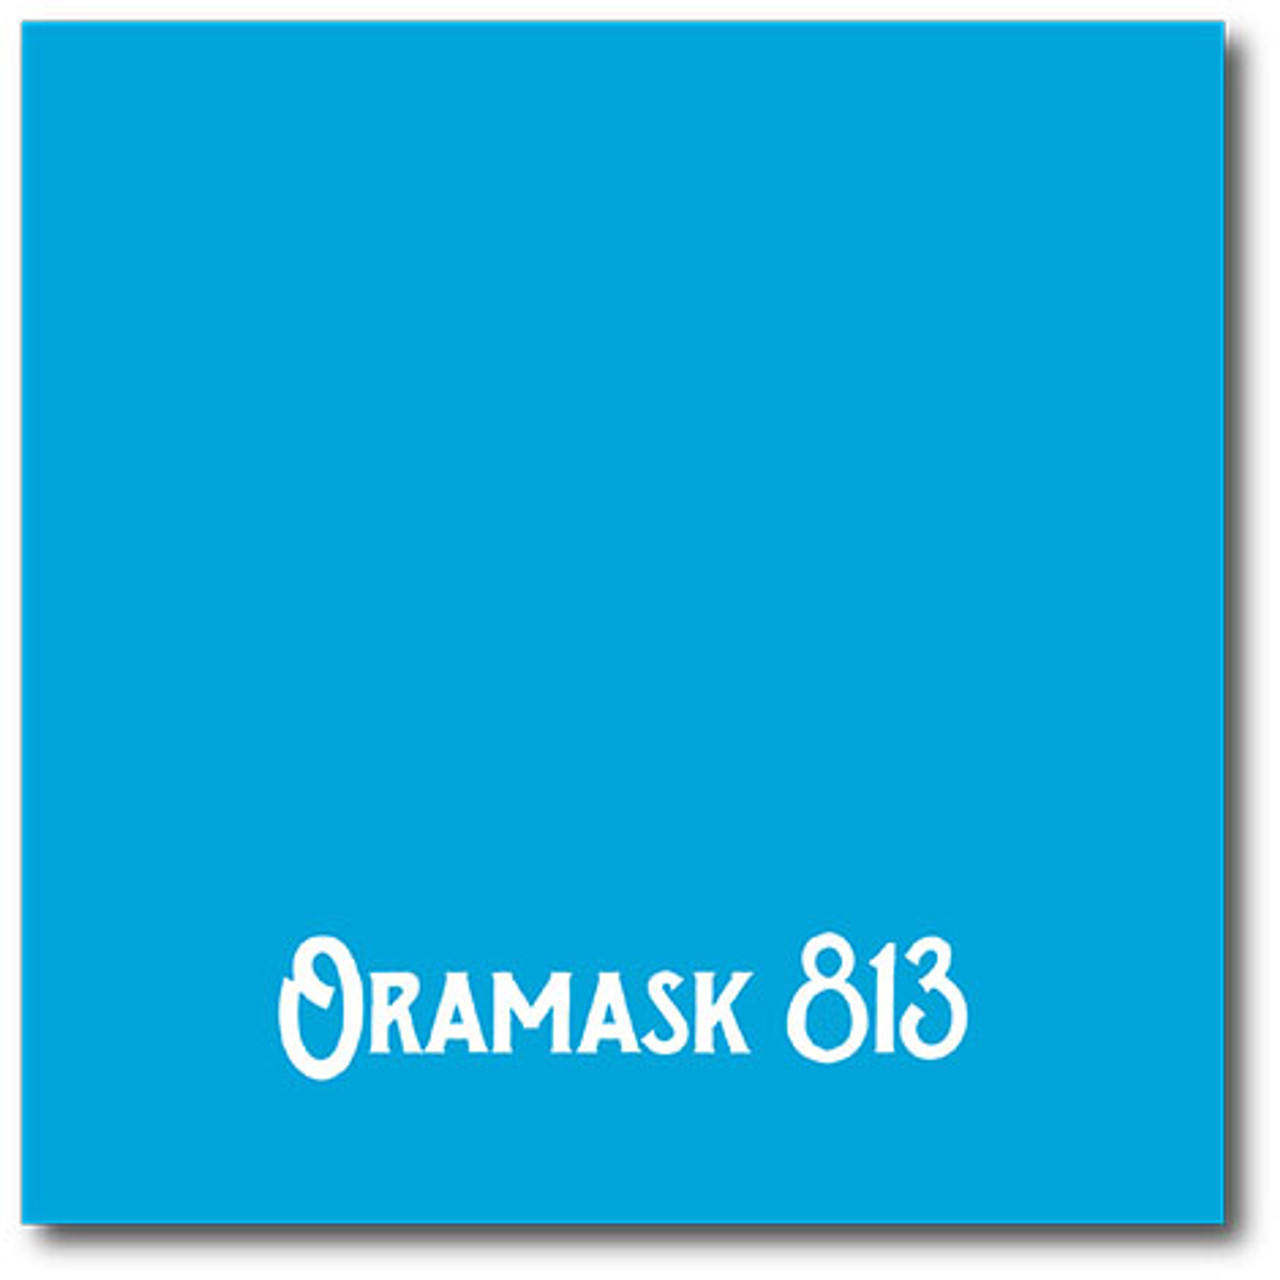 Oracal ORAMASK 813 Stencil Vinyl Rolls